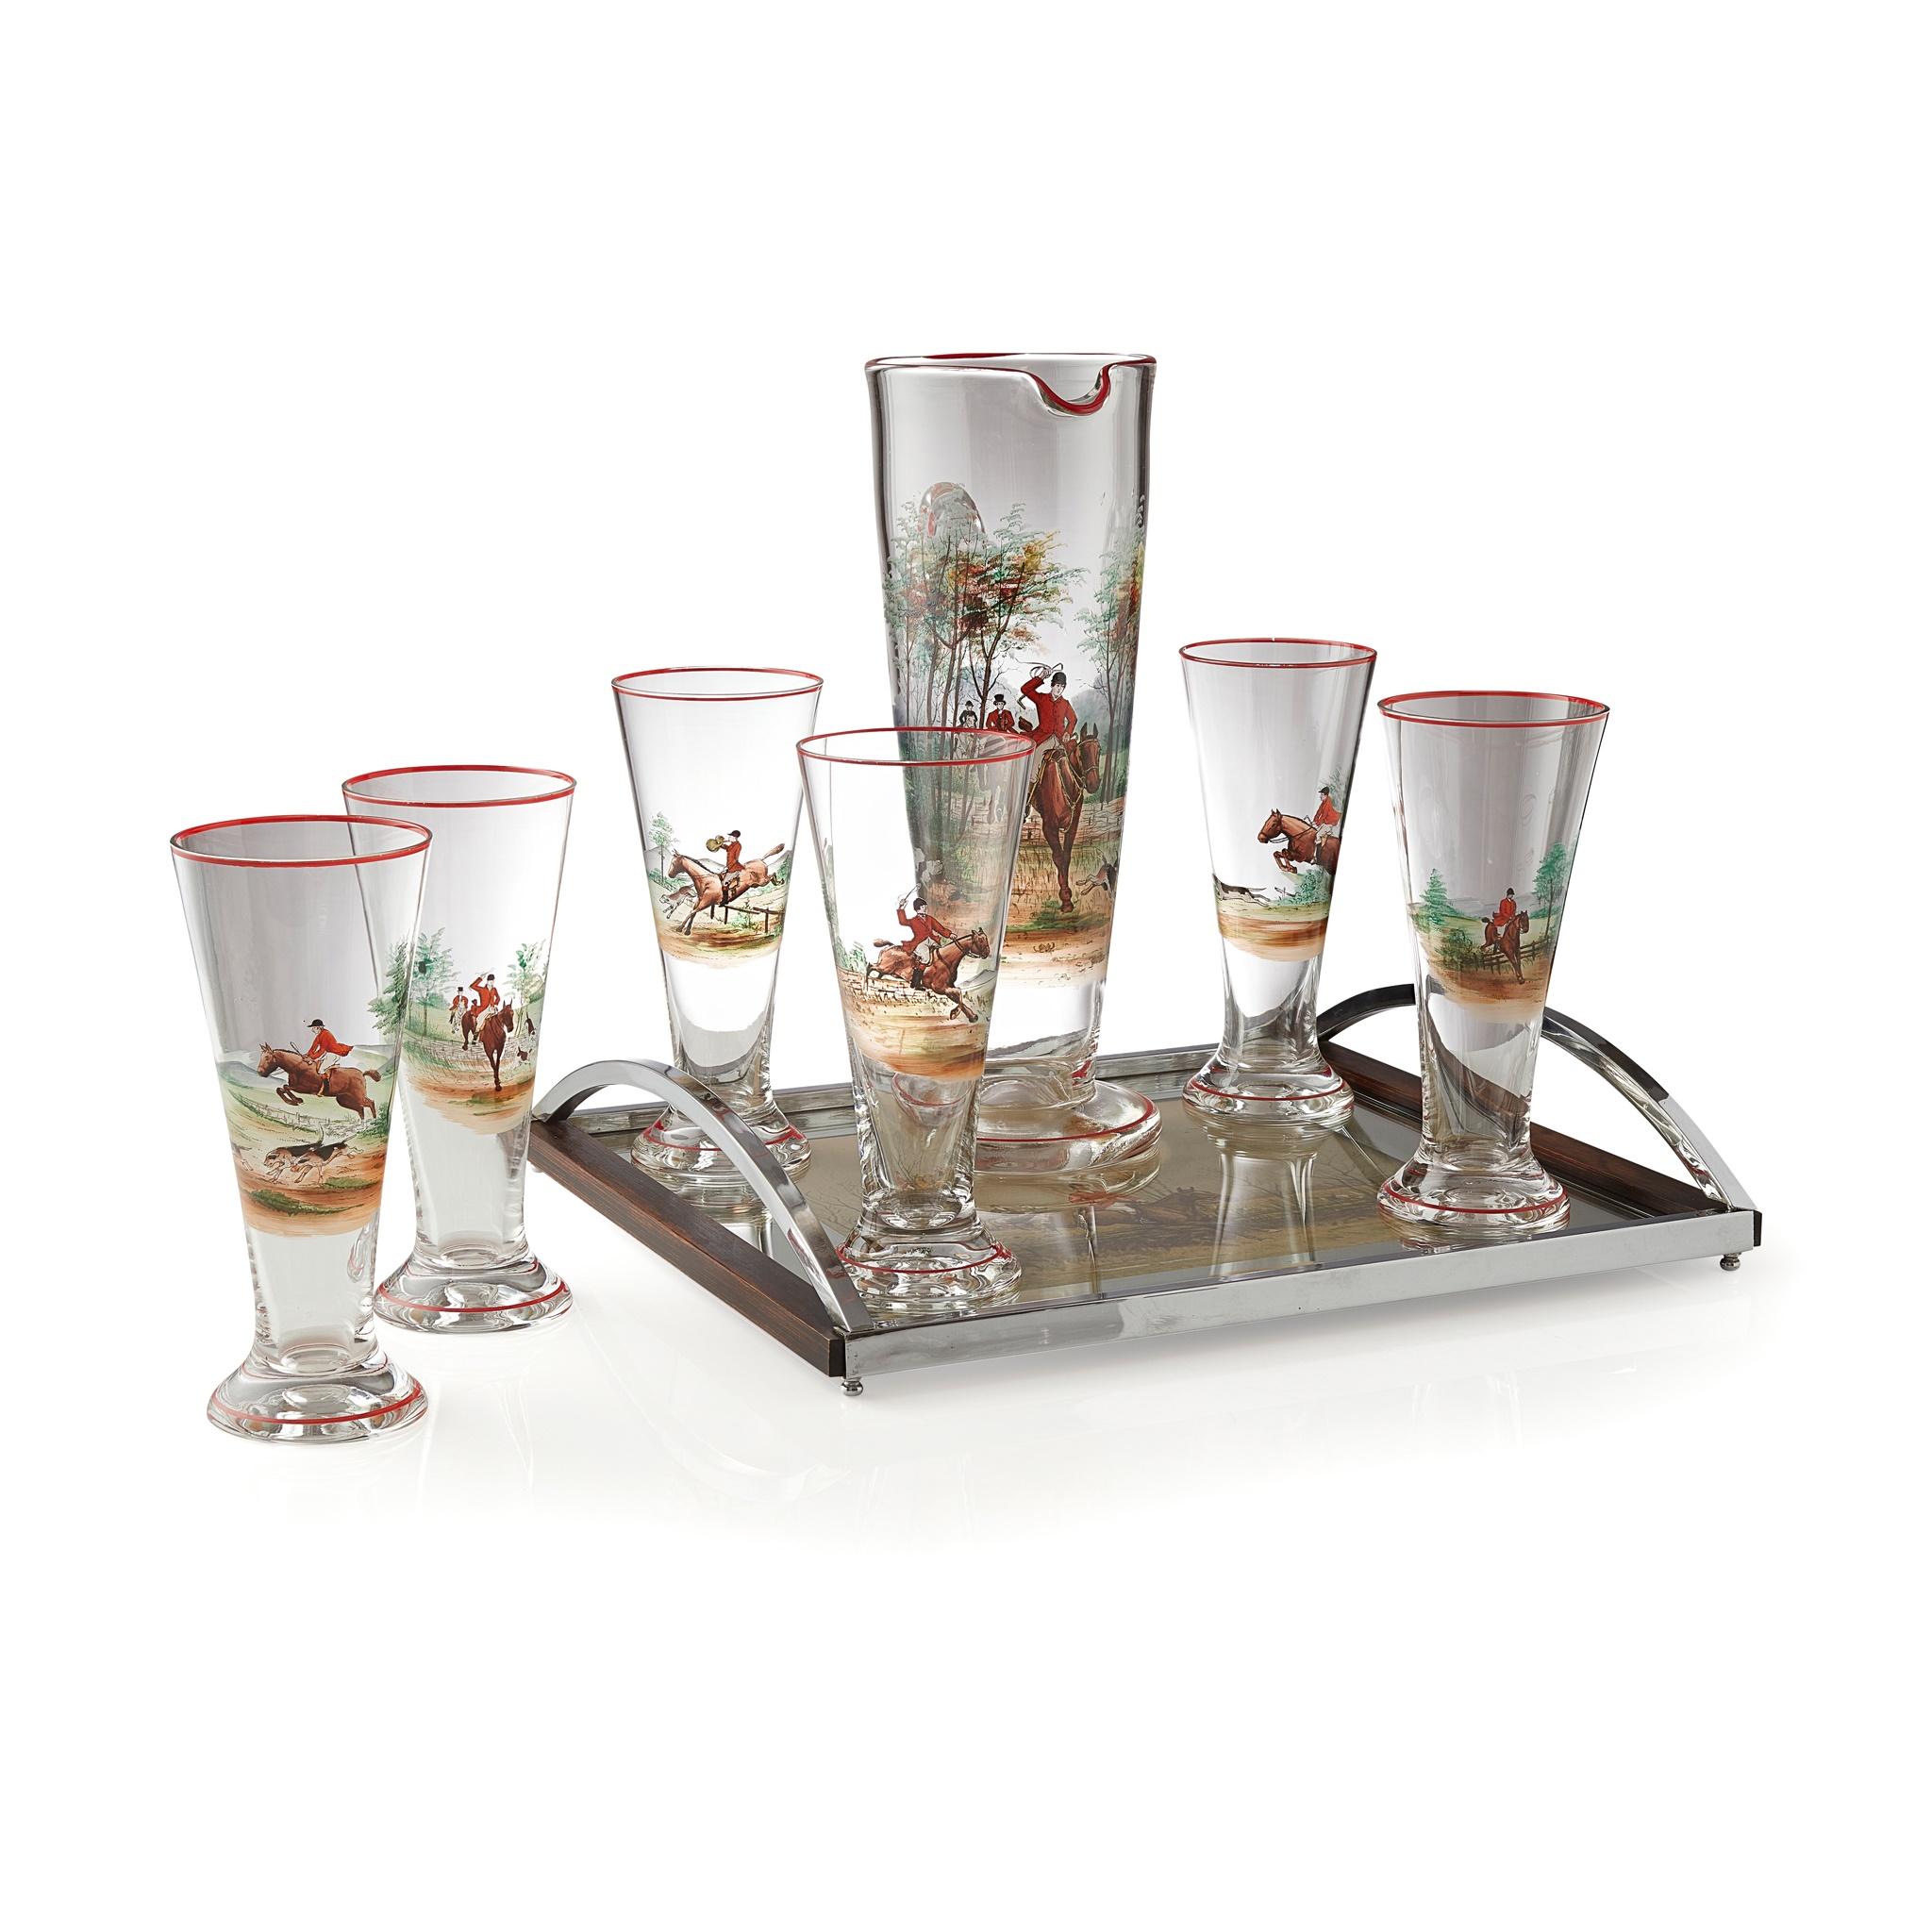 ART DECO ENAMELLED GLASS LEMONADE SET, OF HUNTING INTEREST CIRCA 1930